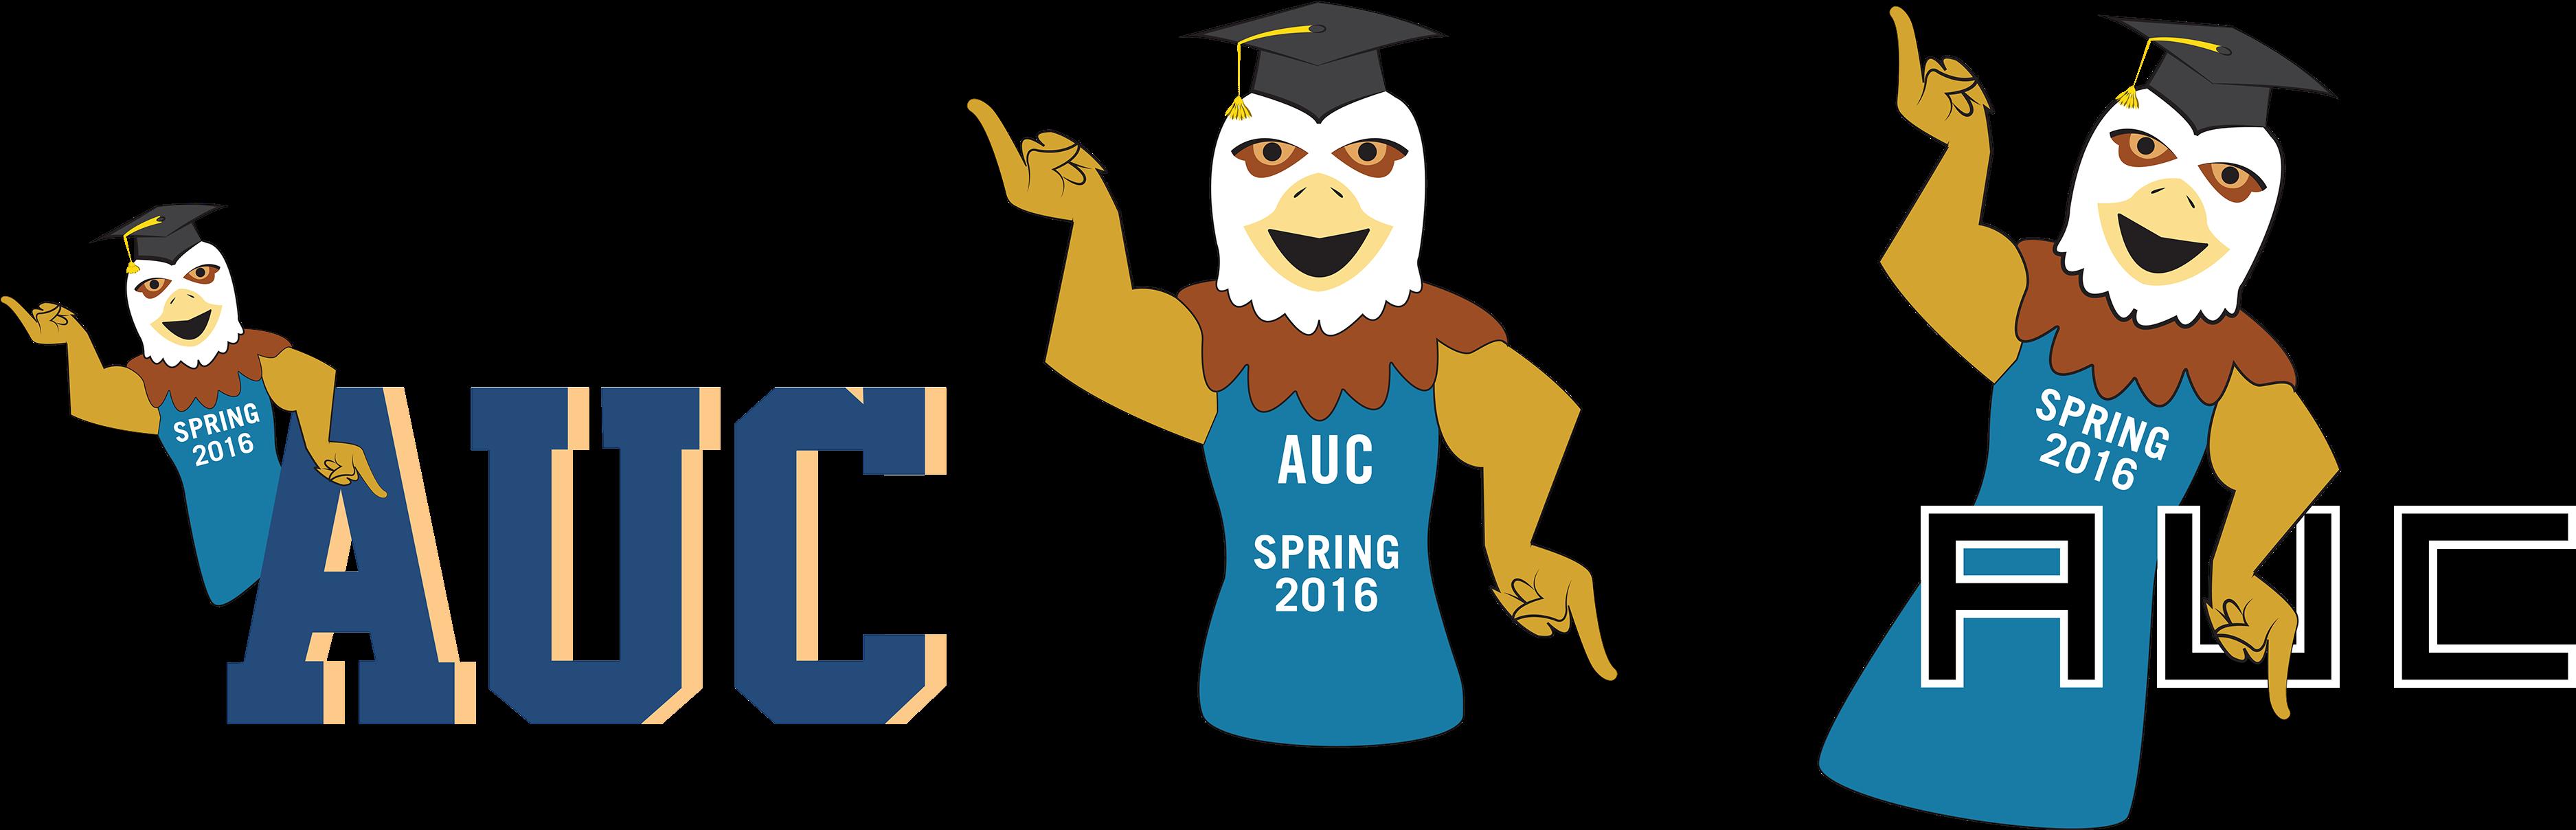 Auc 2016 Graduation Snapchat Filters.